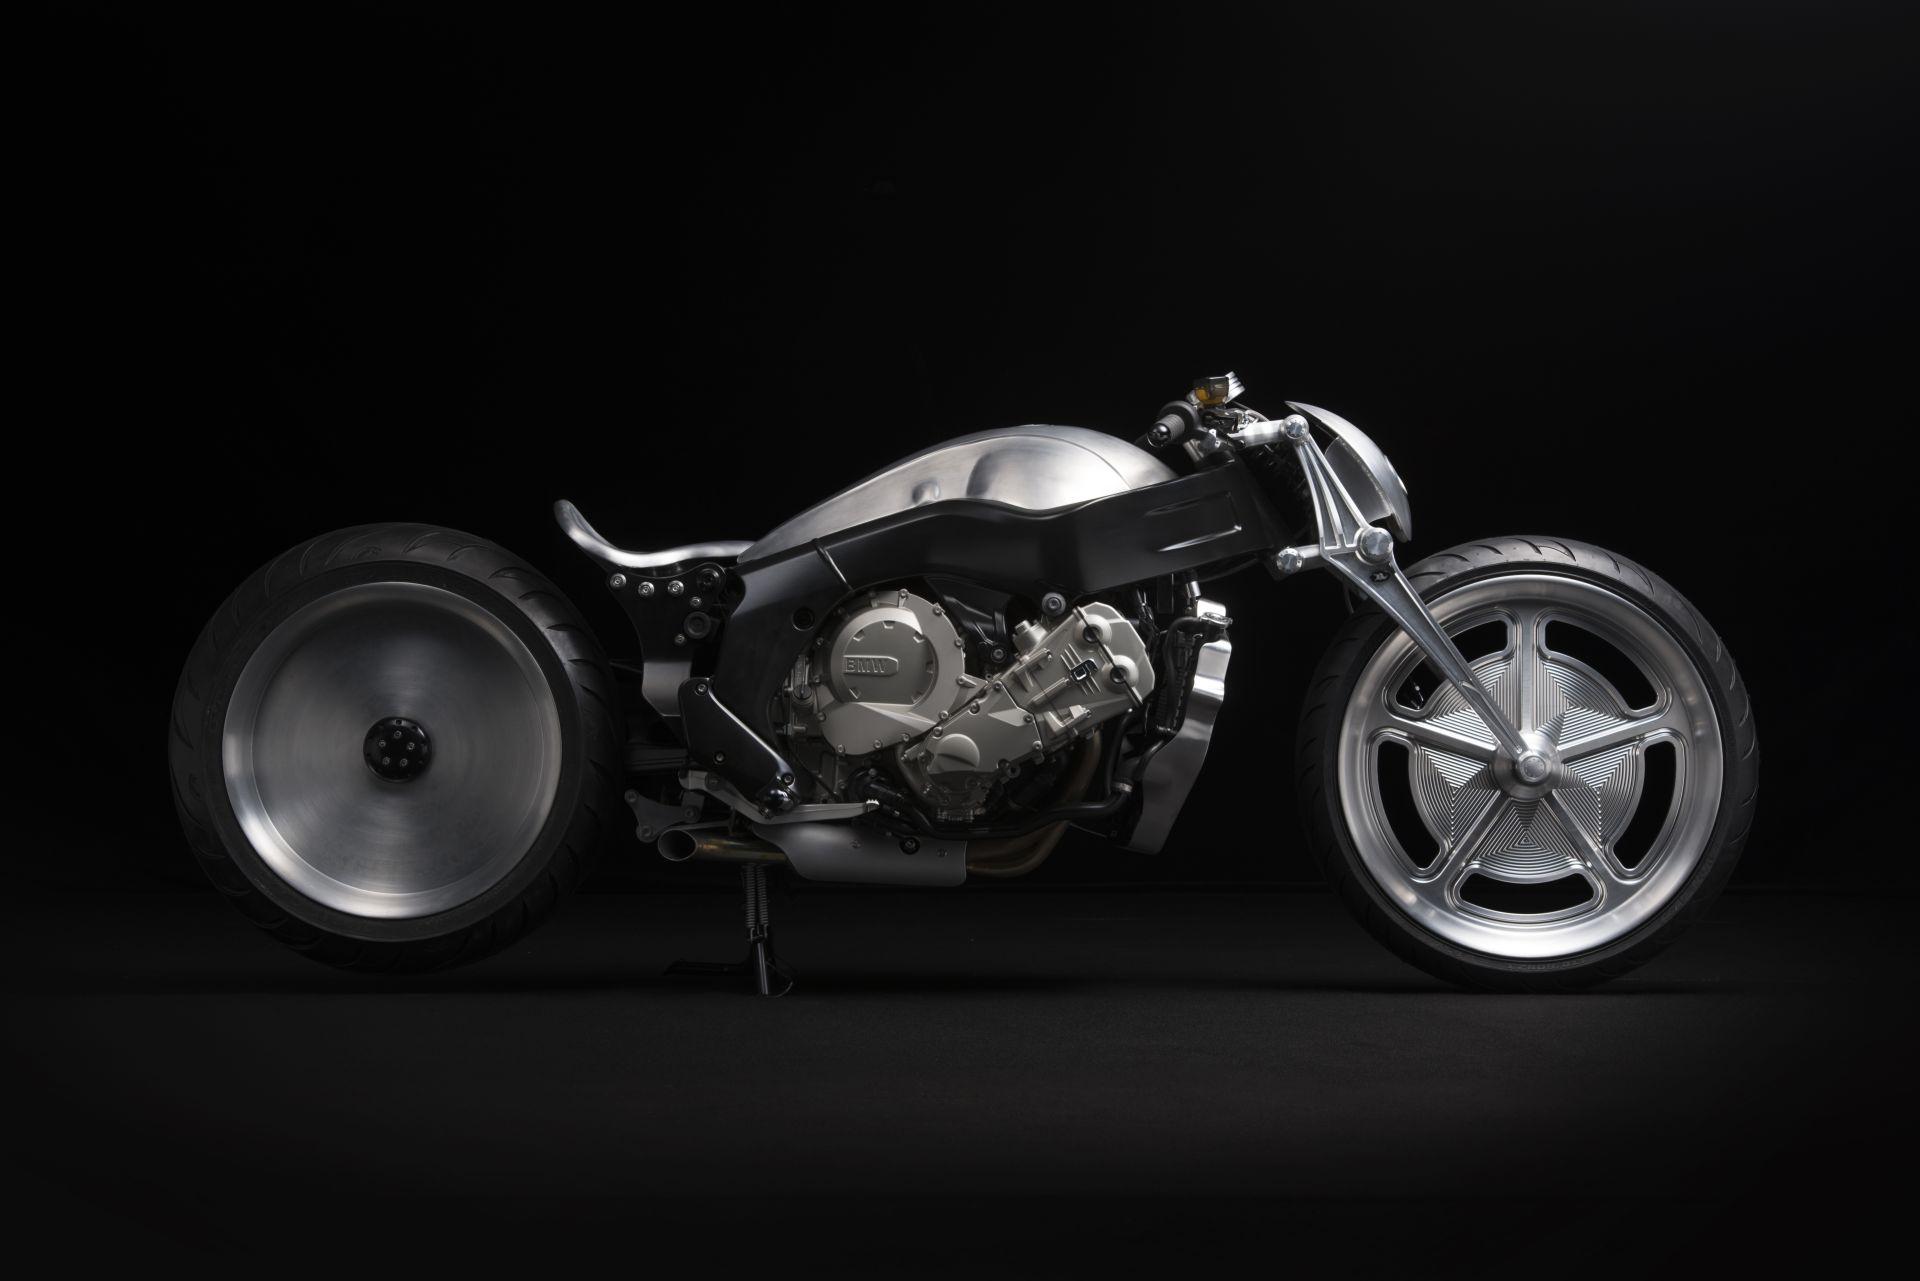 bmw-k1600gtl-becomes-kens-factory-special-evil-machine-lust-video-photo-gallery_6.jpg